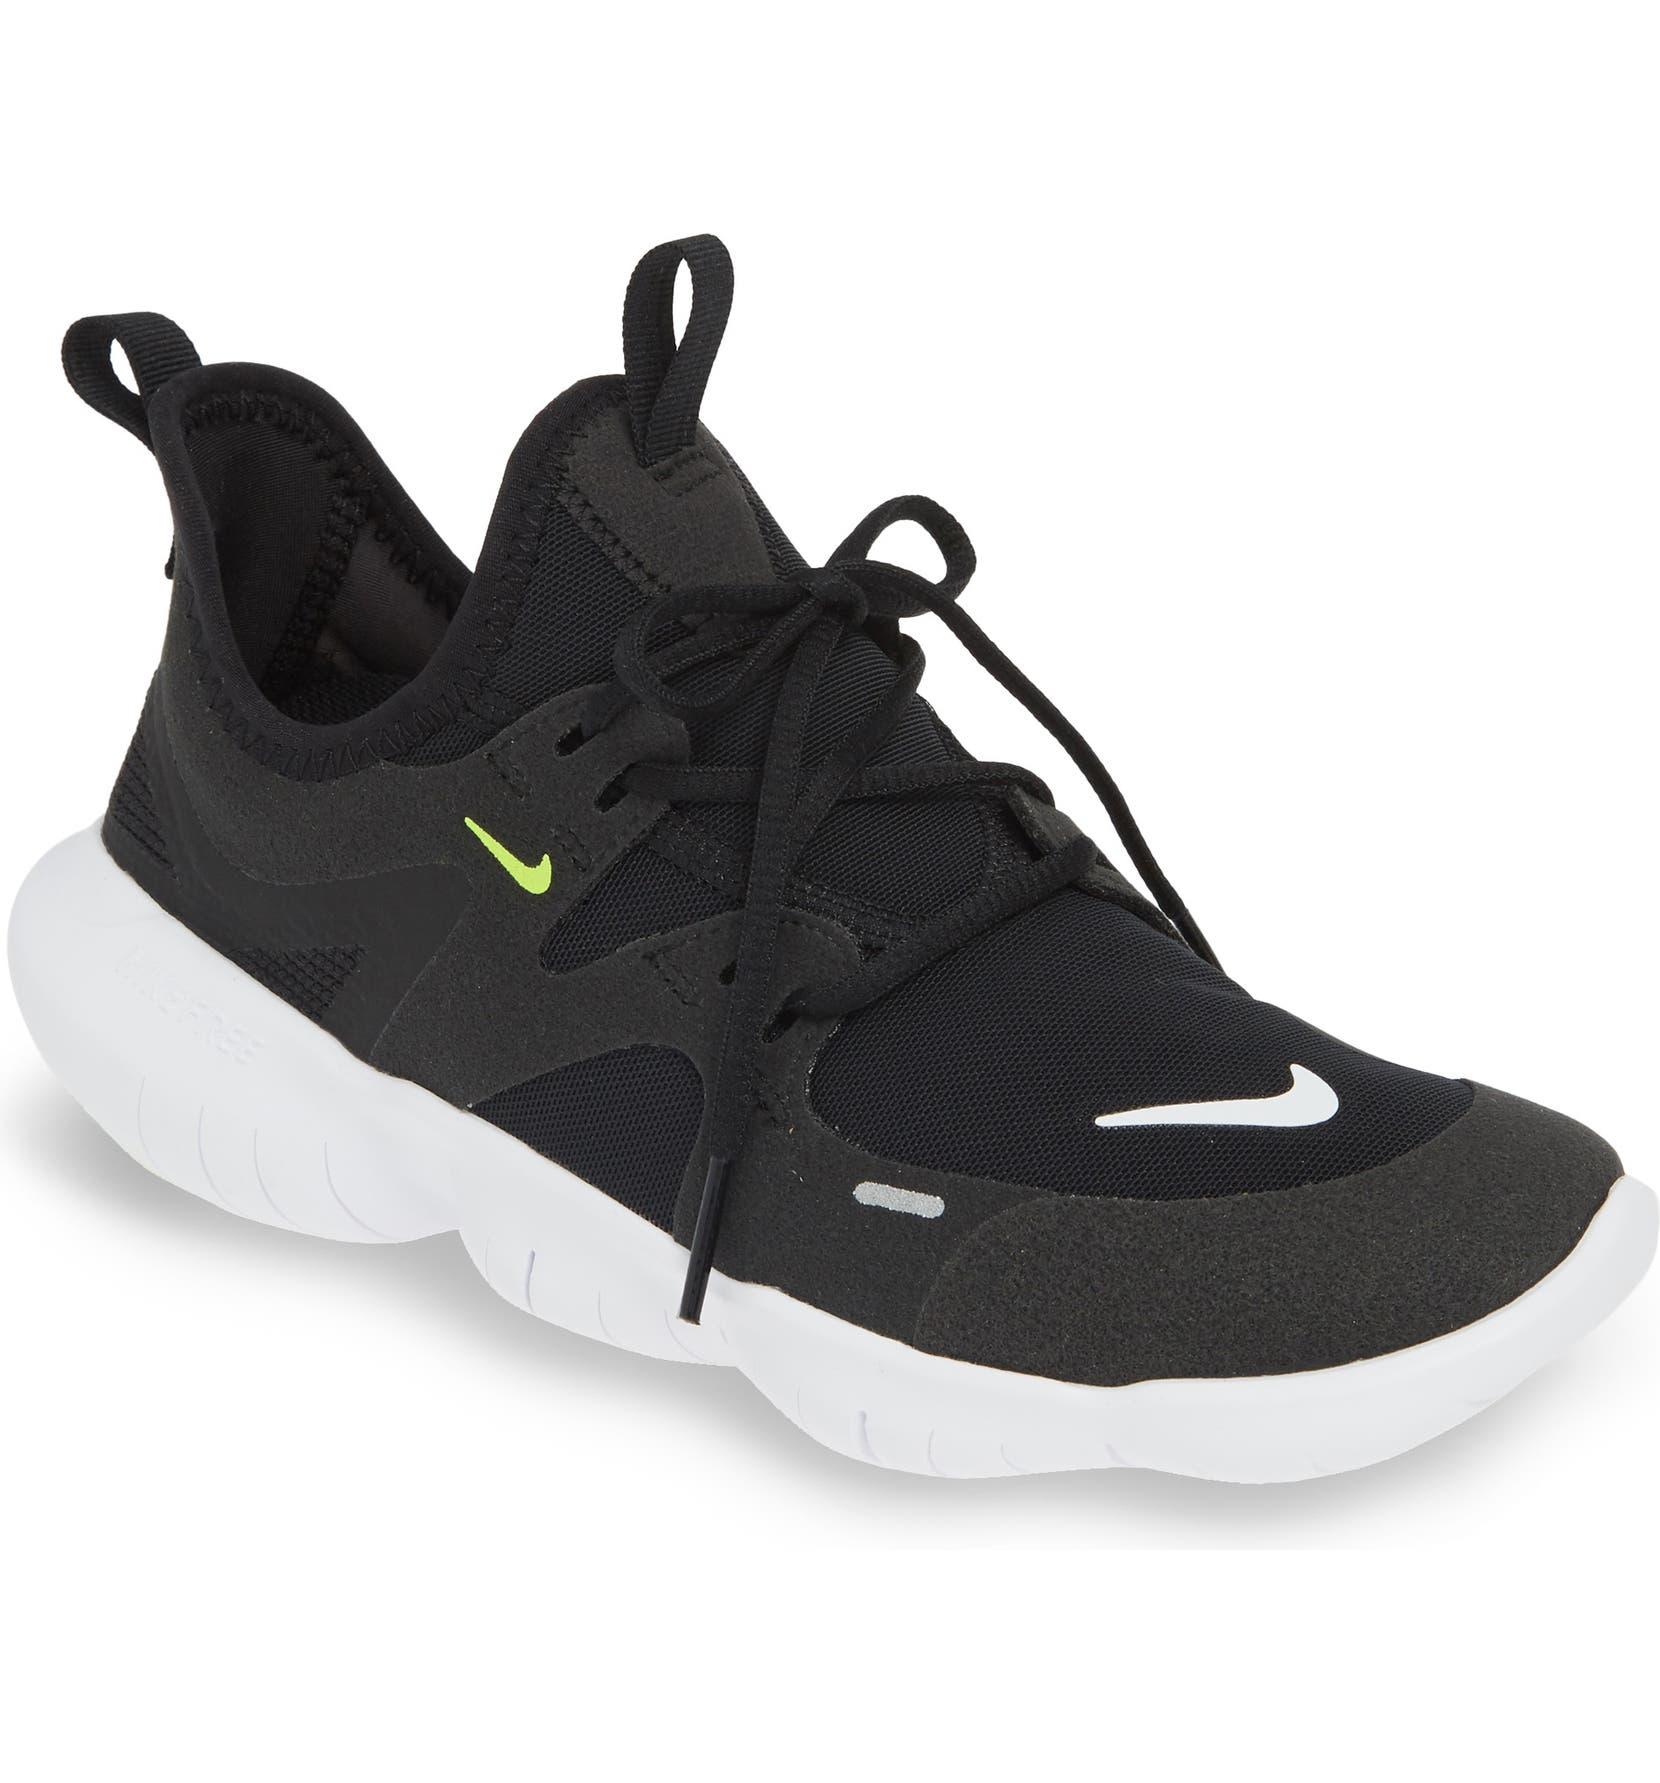 Nike free run 5.0 sneakers in black